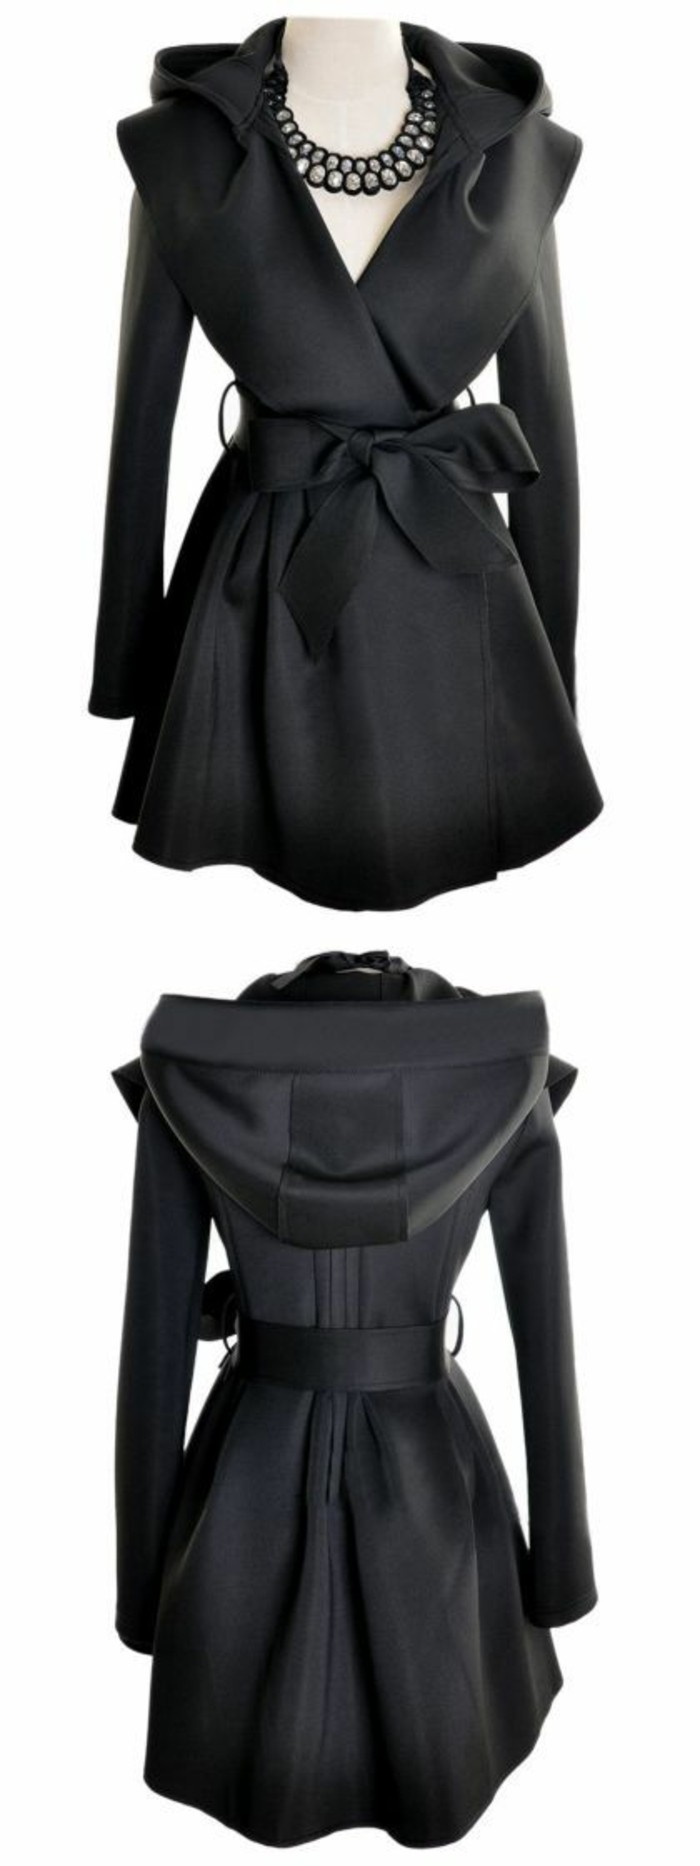 trench-femme-en-noir-coquet-féminin-avec-capuche